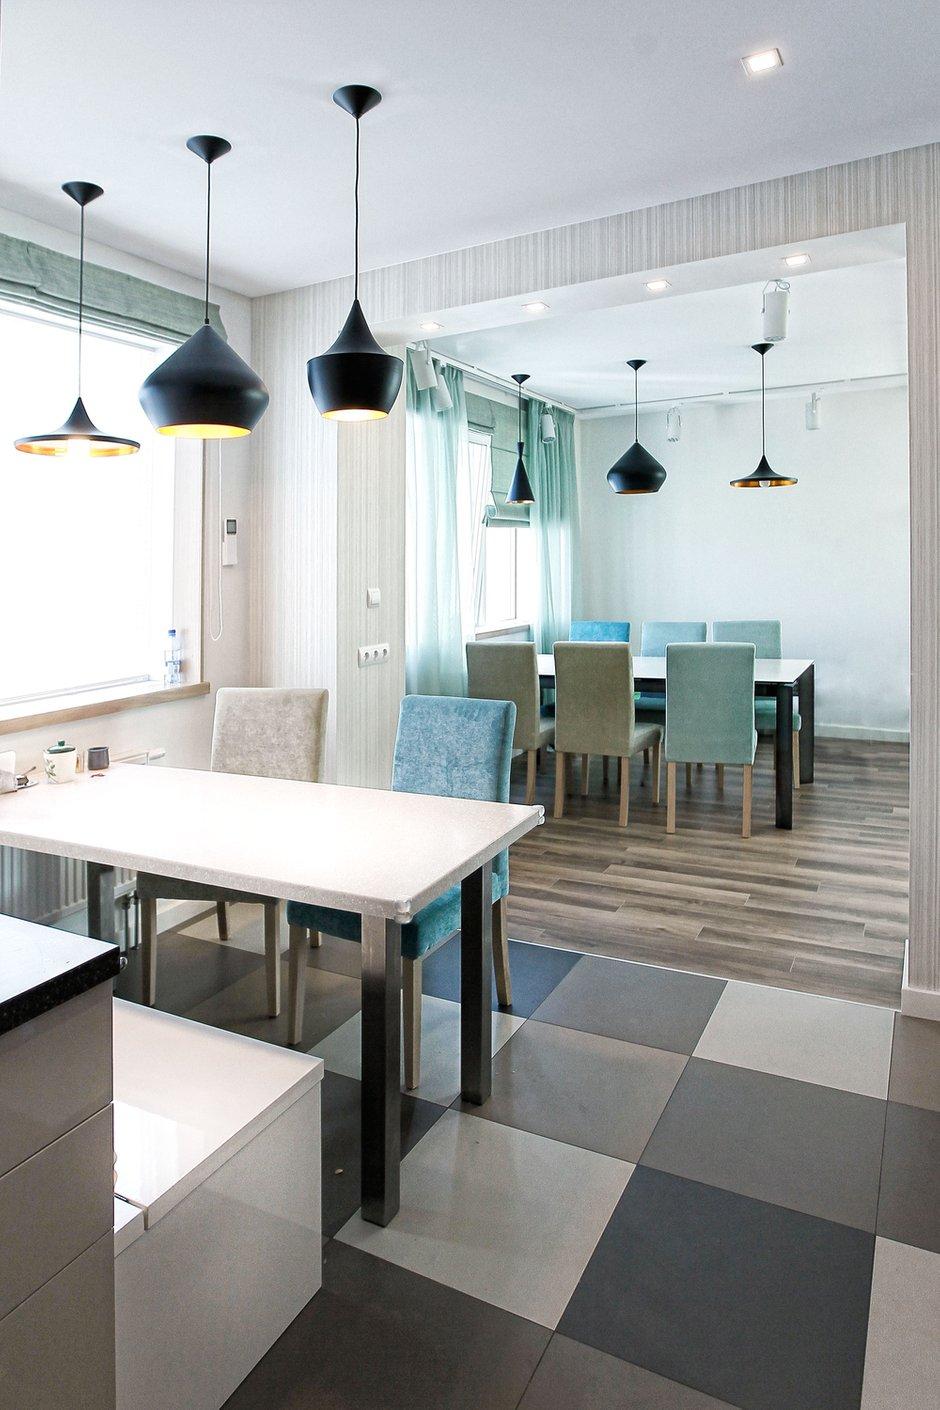 Фотография: Кухня и столовая в стиле Скандинавский, Квартира, Текстиль, Декор, Дома и квартиры, IKEA, Проект недели, Москва – фото на INMYROOM